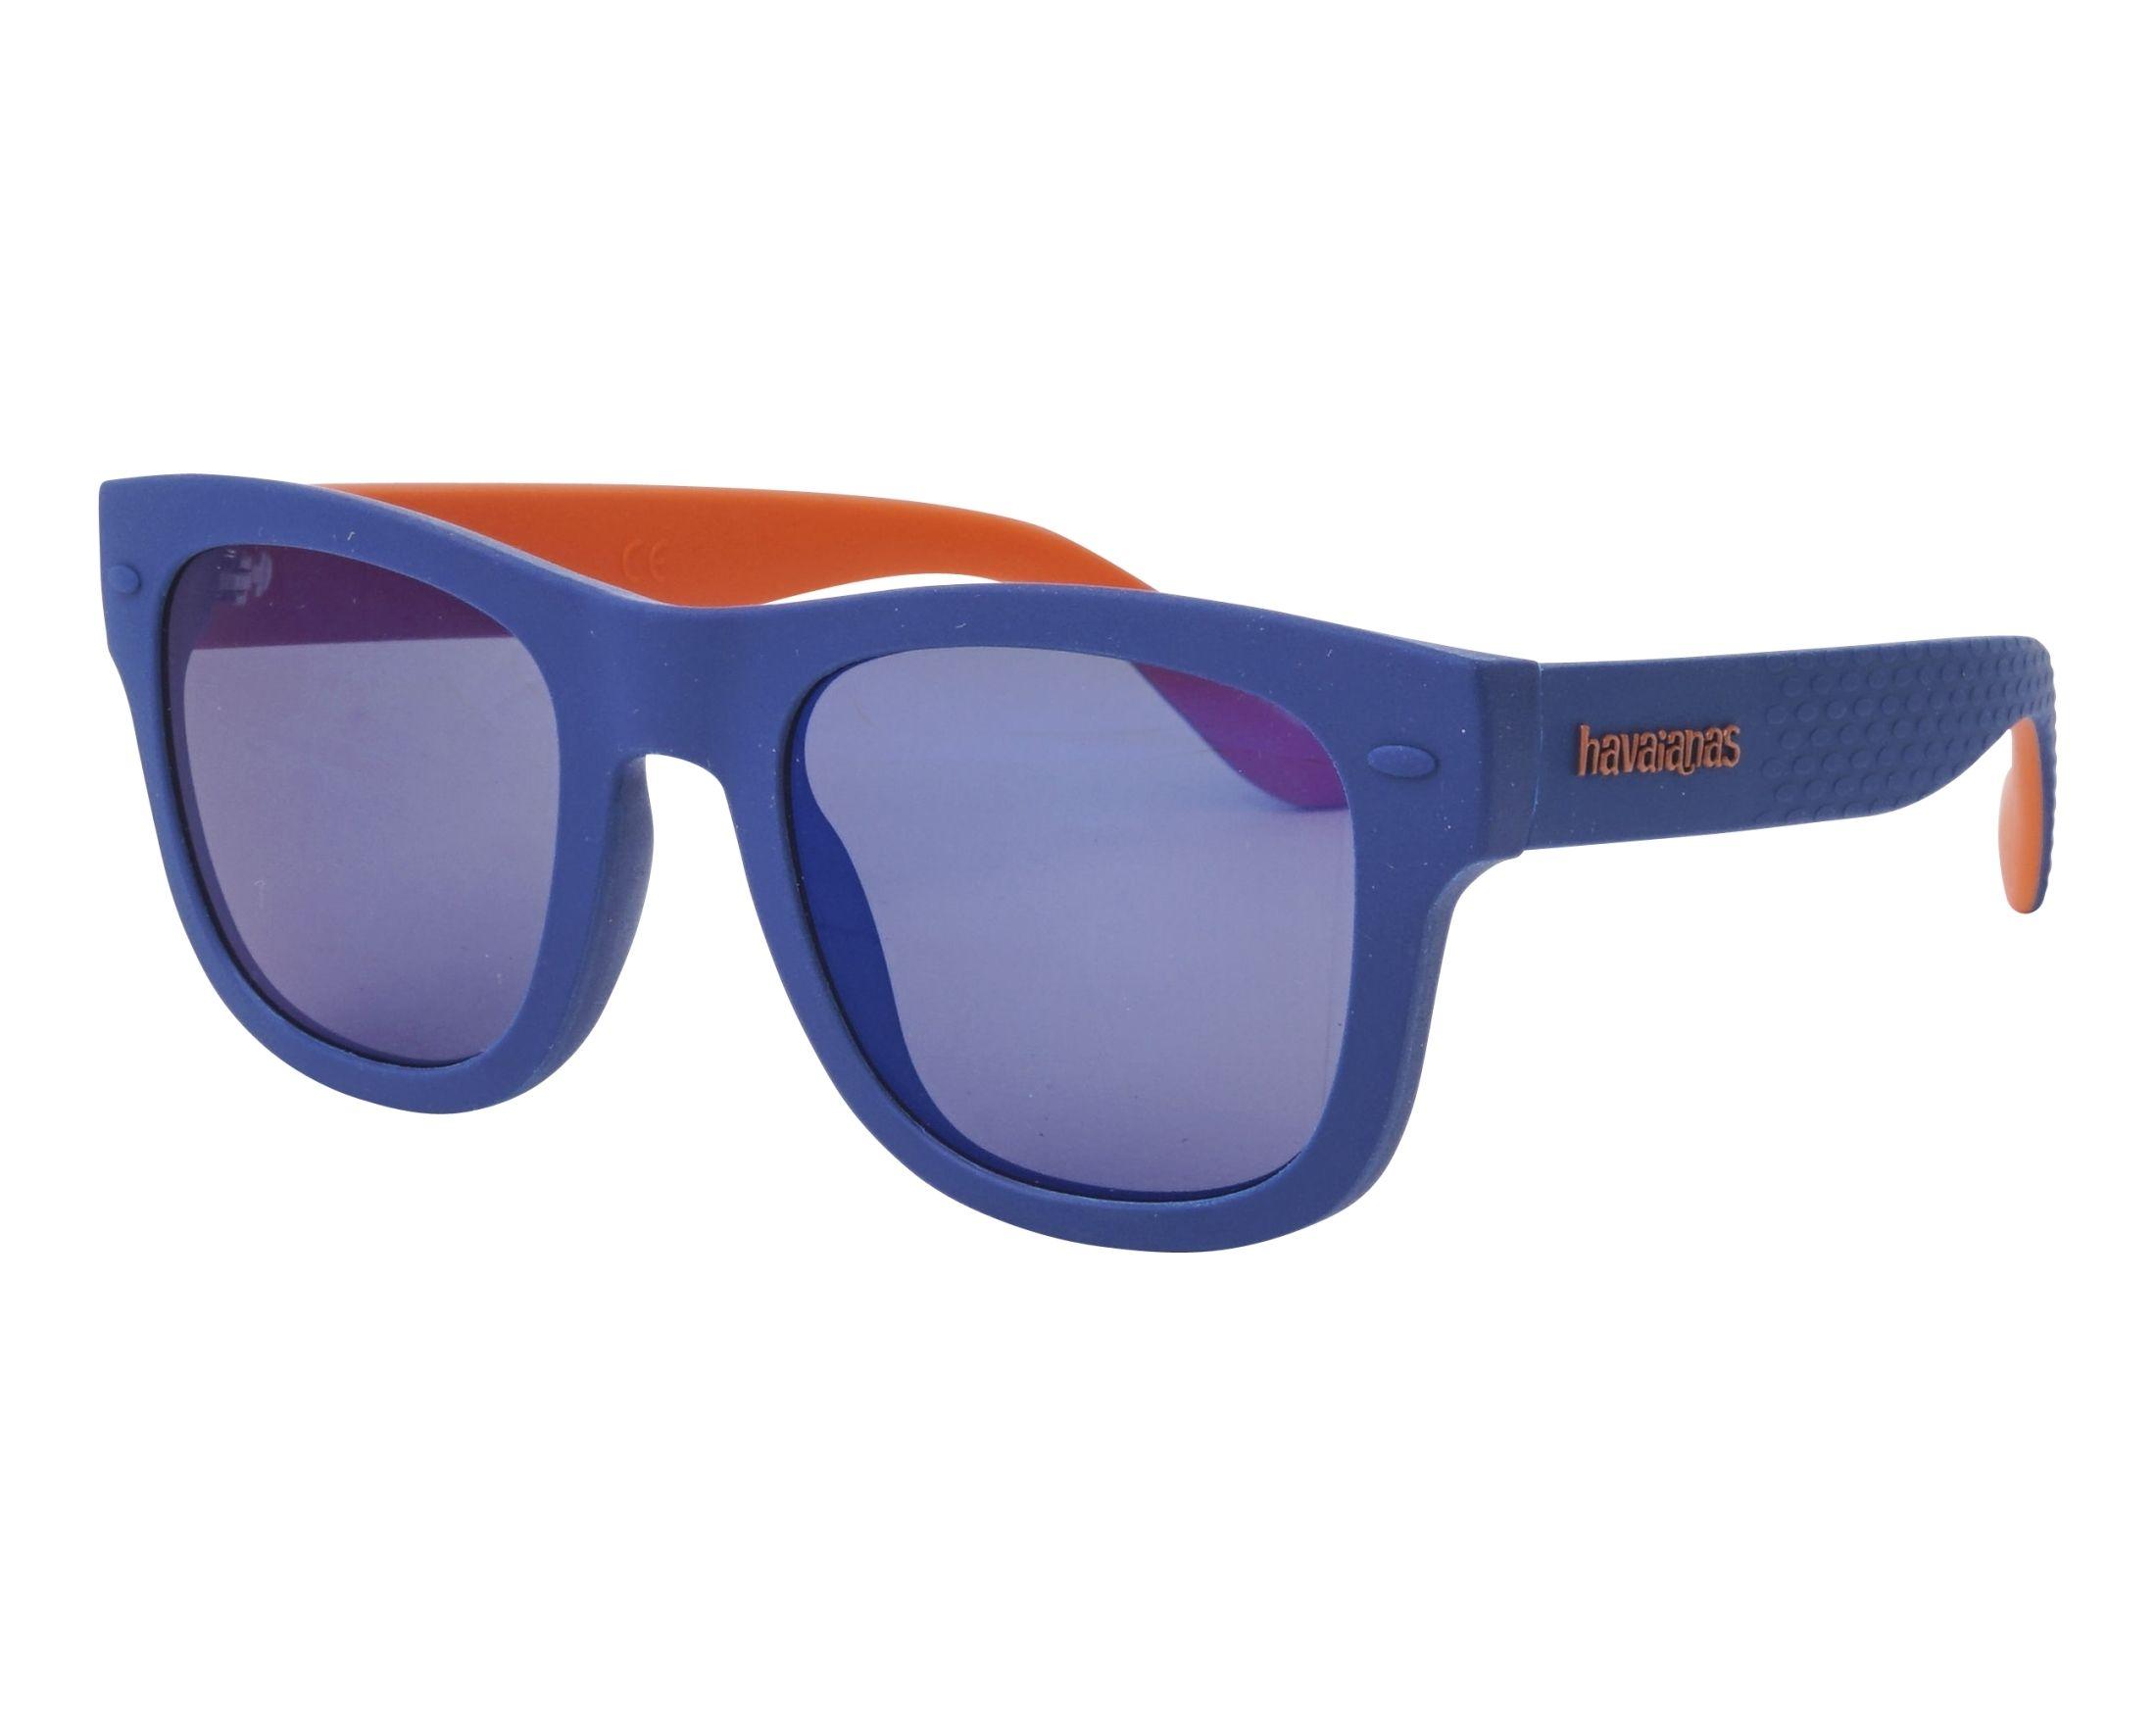 8b4f39901ff Sunglasses Havaianas PARATY-M RTCXT 50-21 Blue Orange profile view